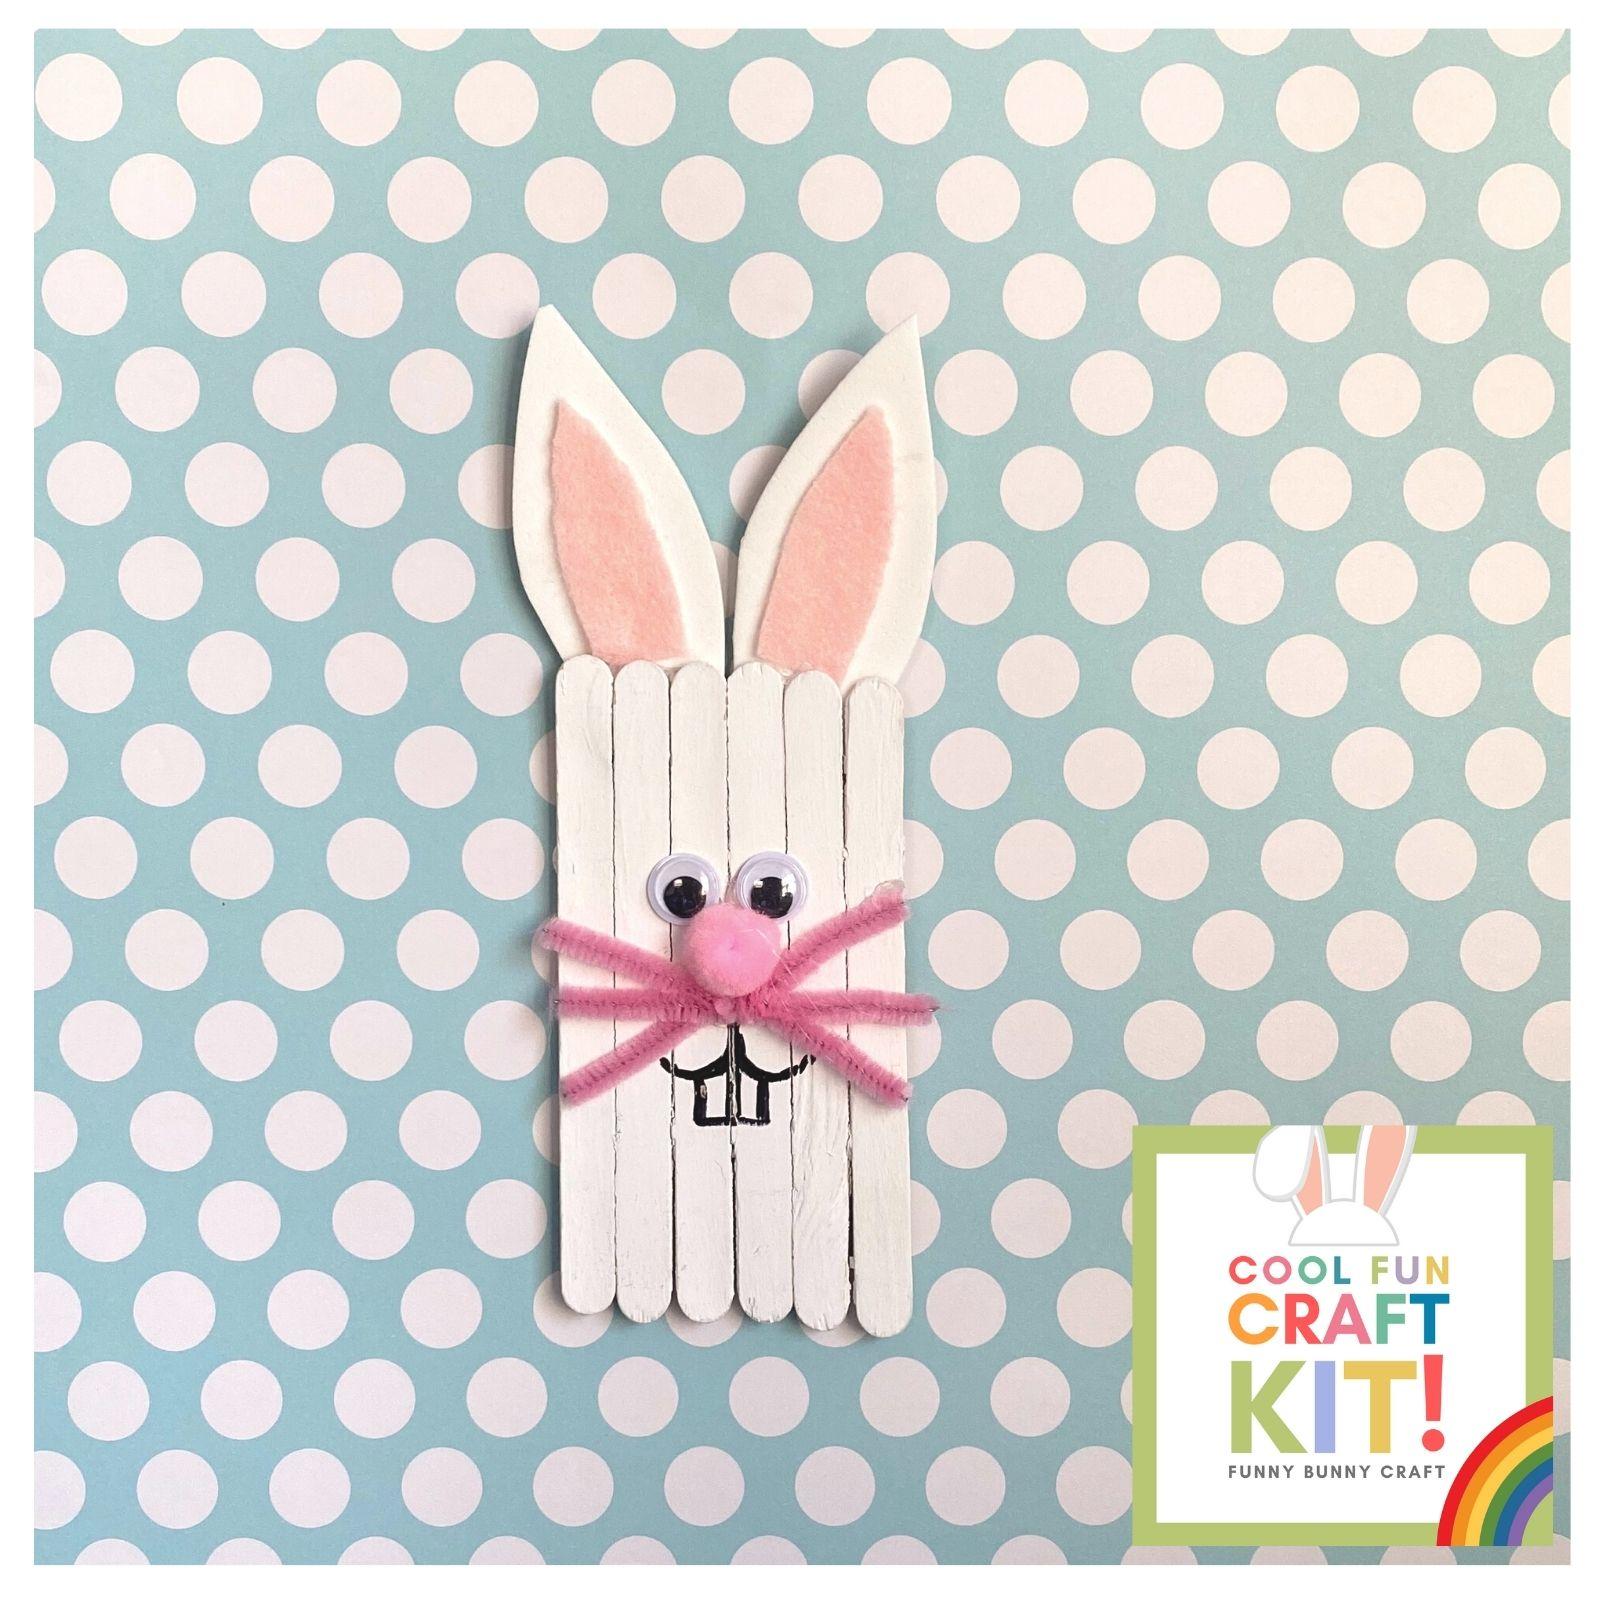 Funny Bunny Craft Kit